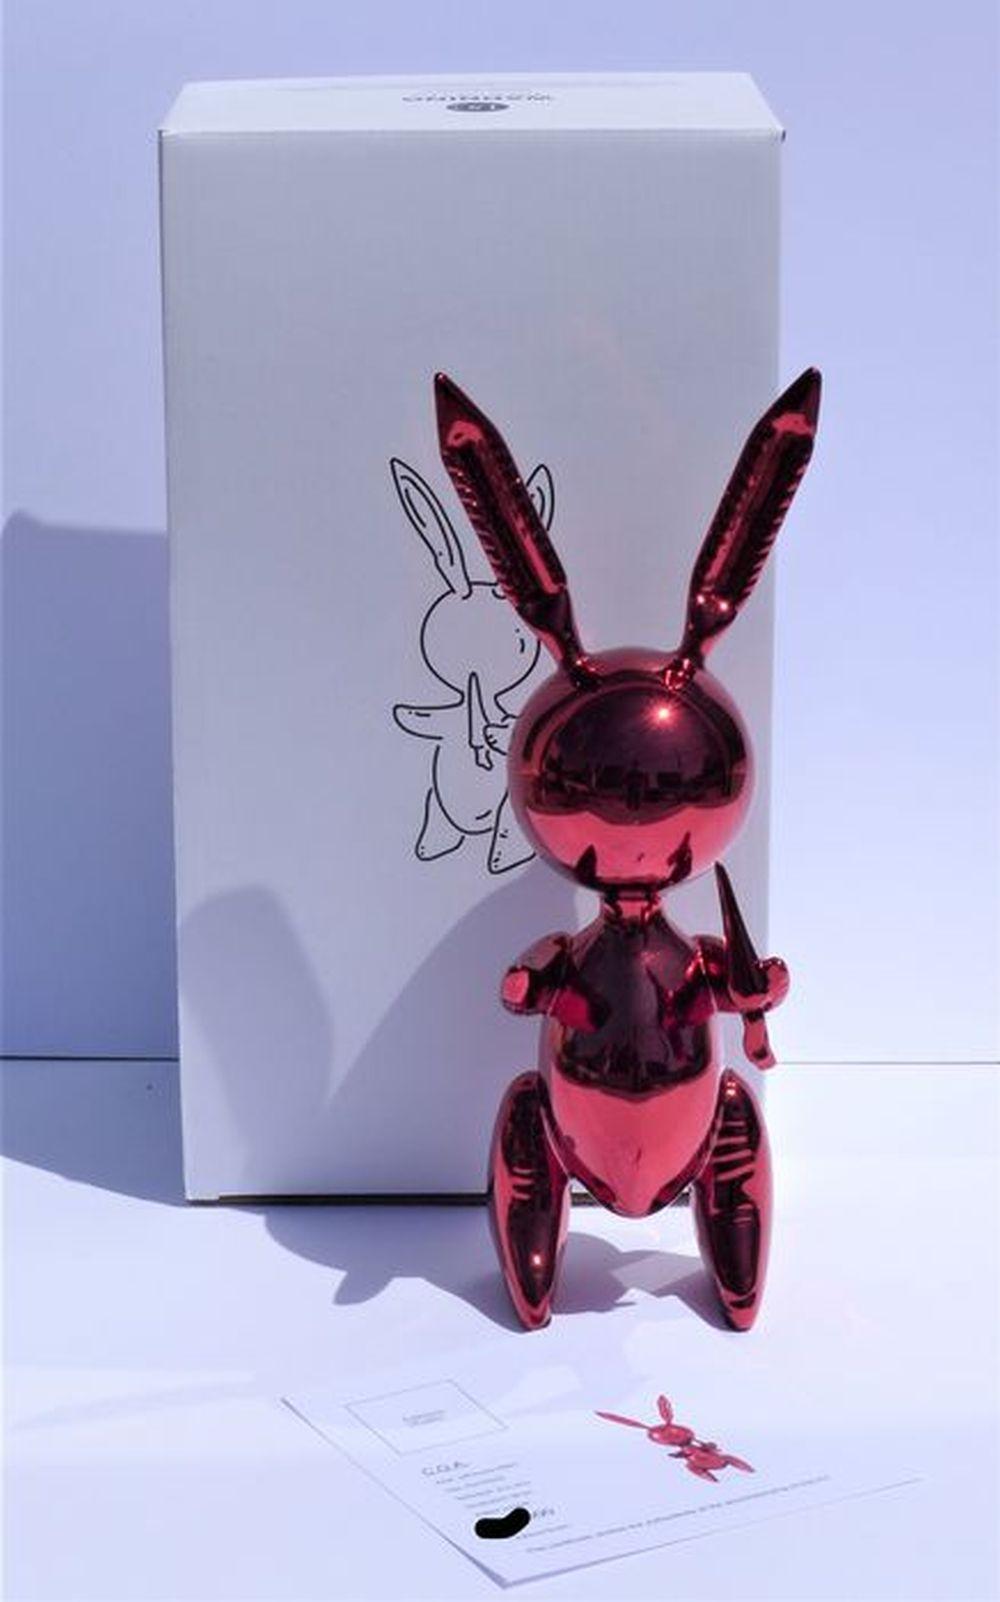 Jeff Koons (d'après) - Balloon Rabbit Red